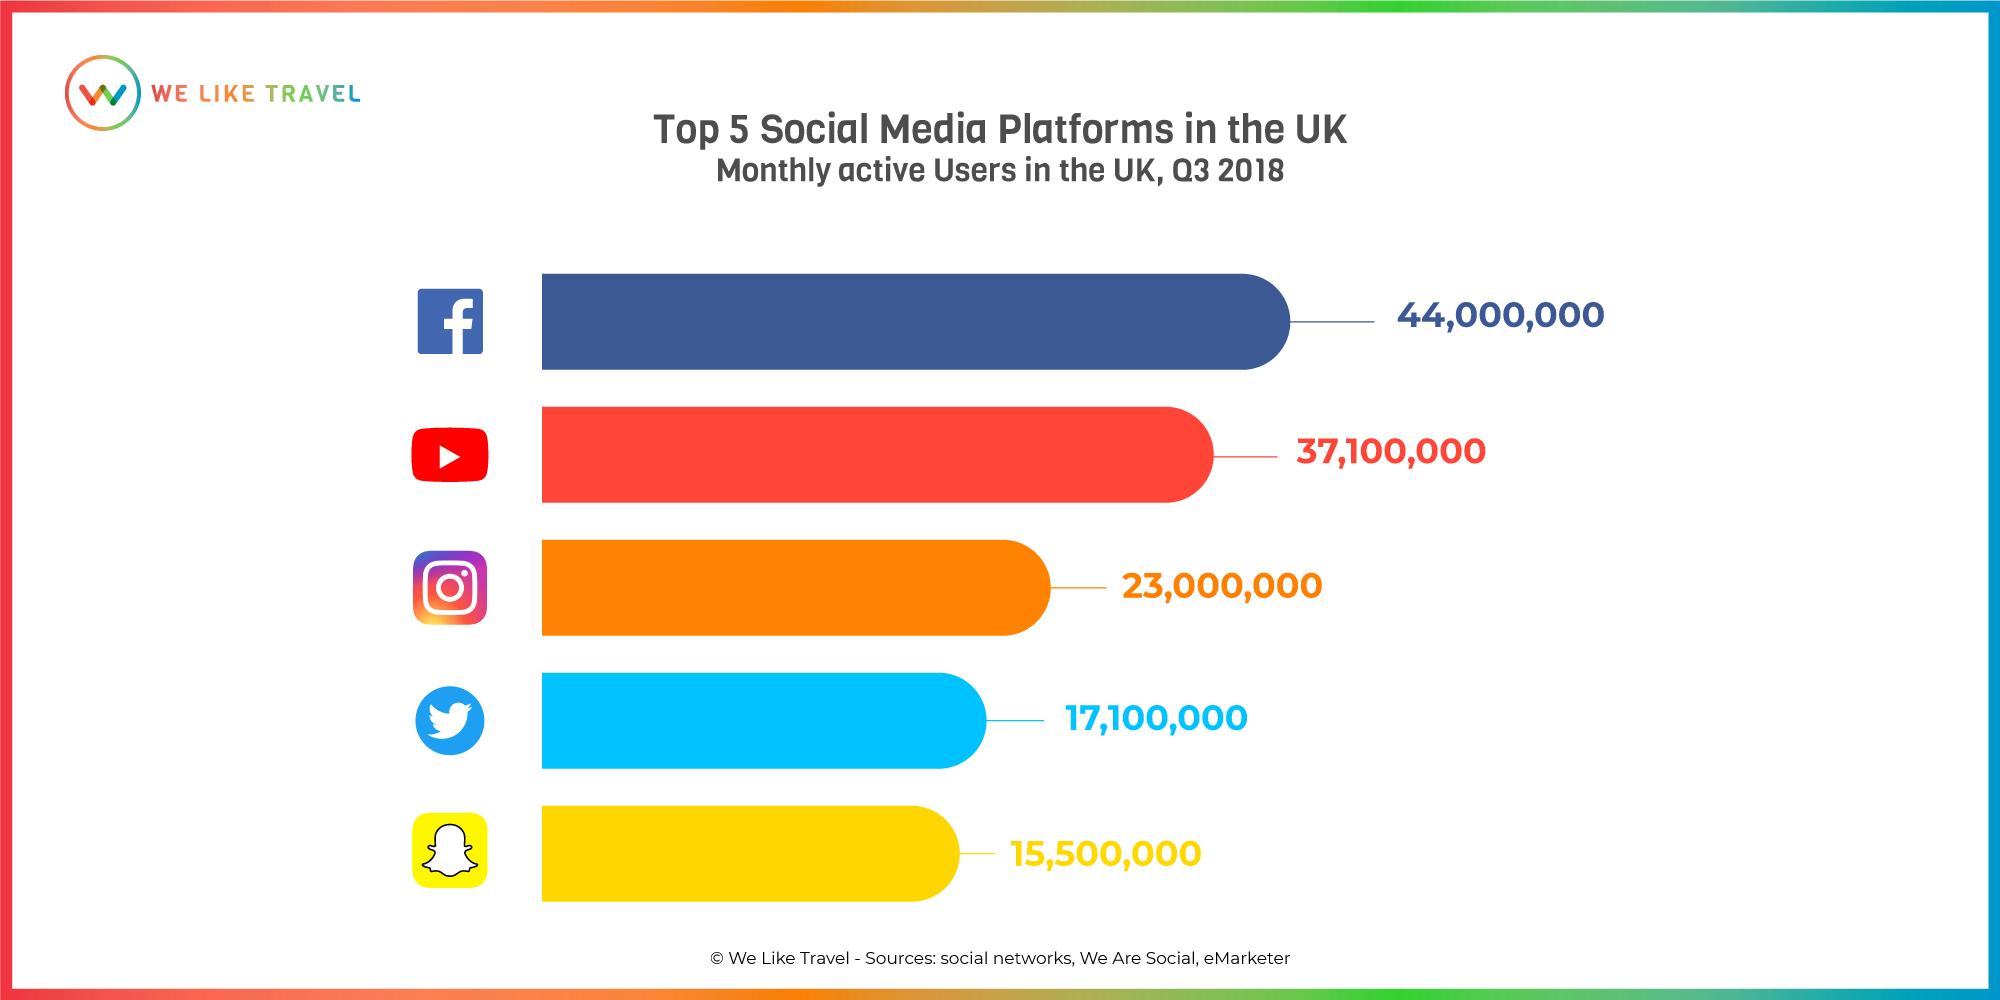 UKUsers-social-media-uk